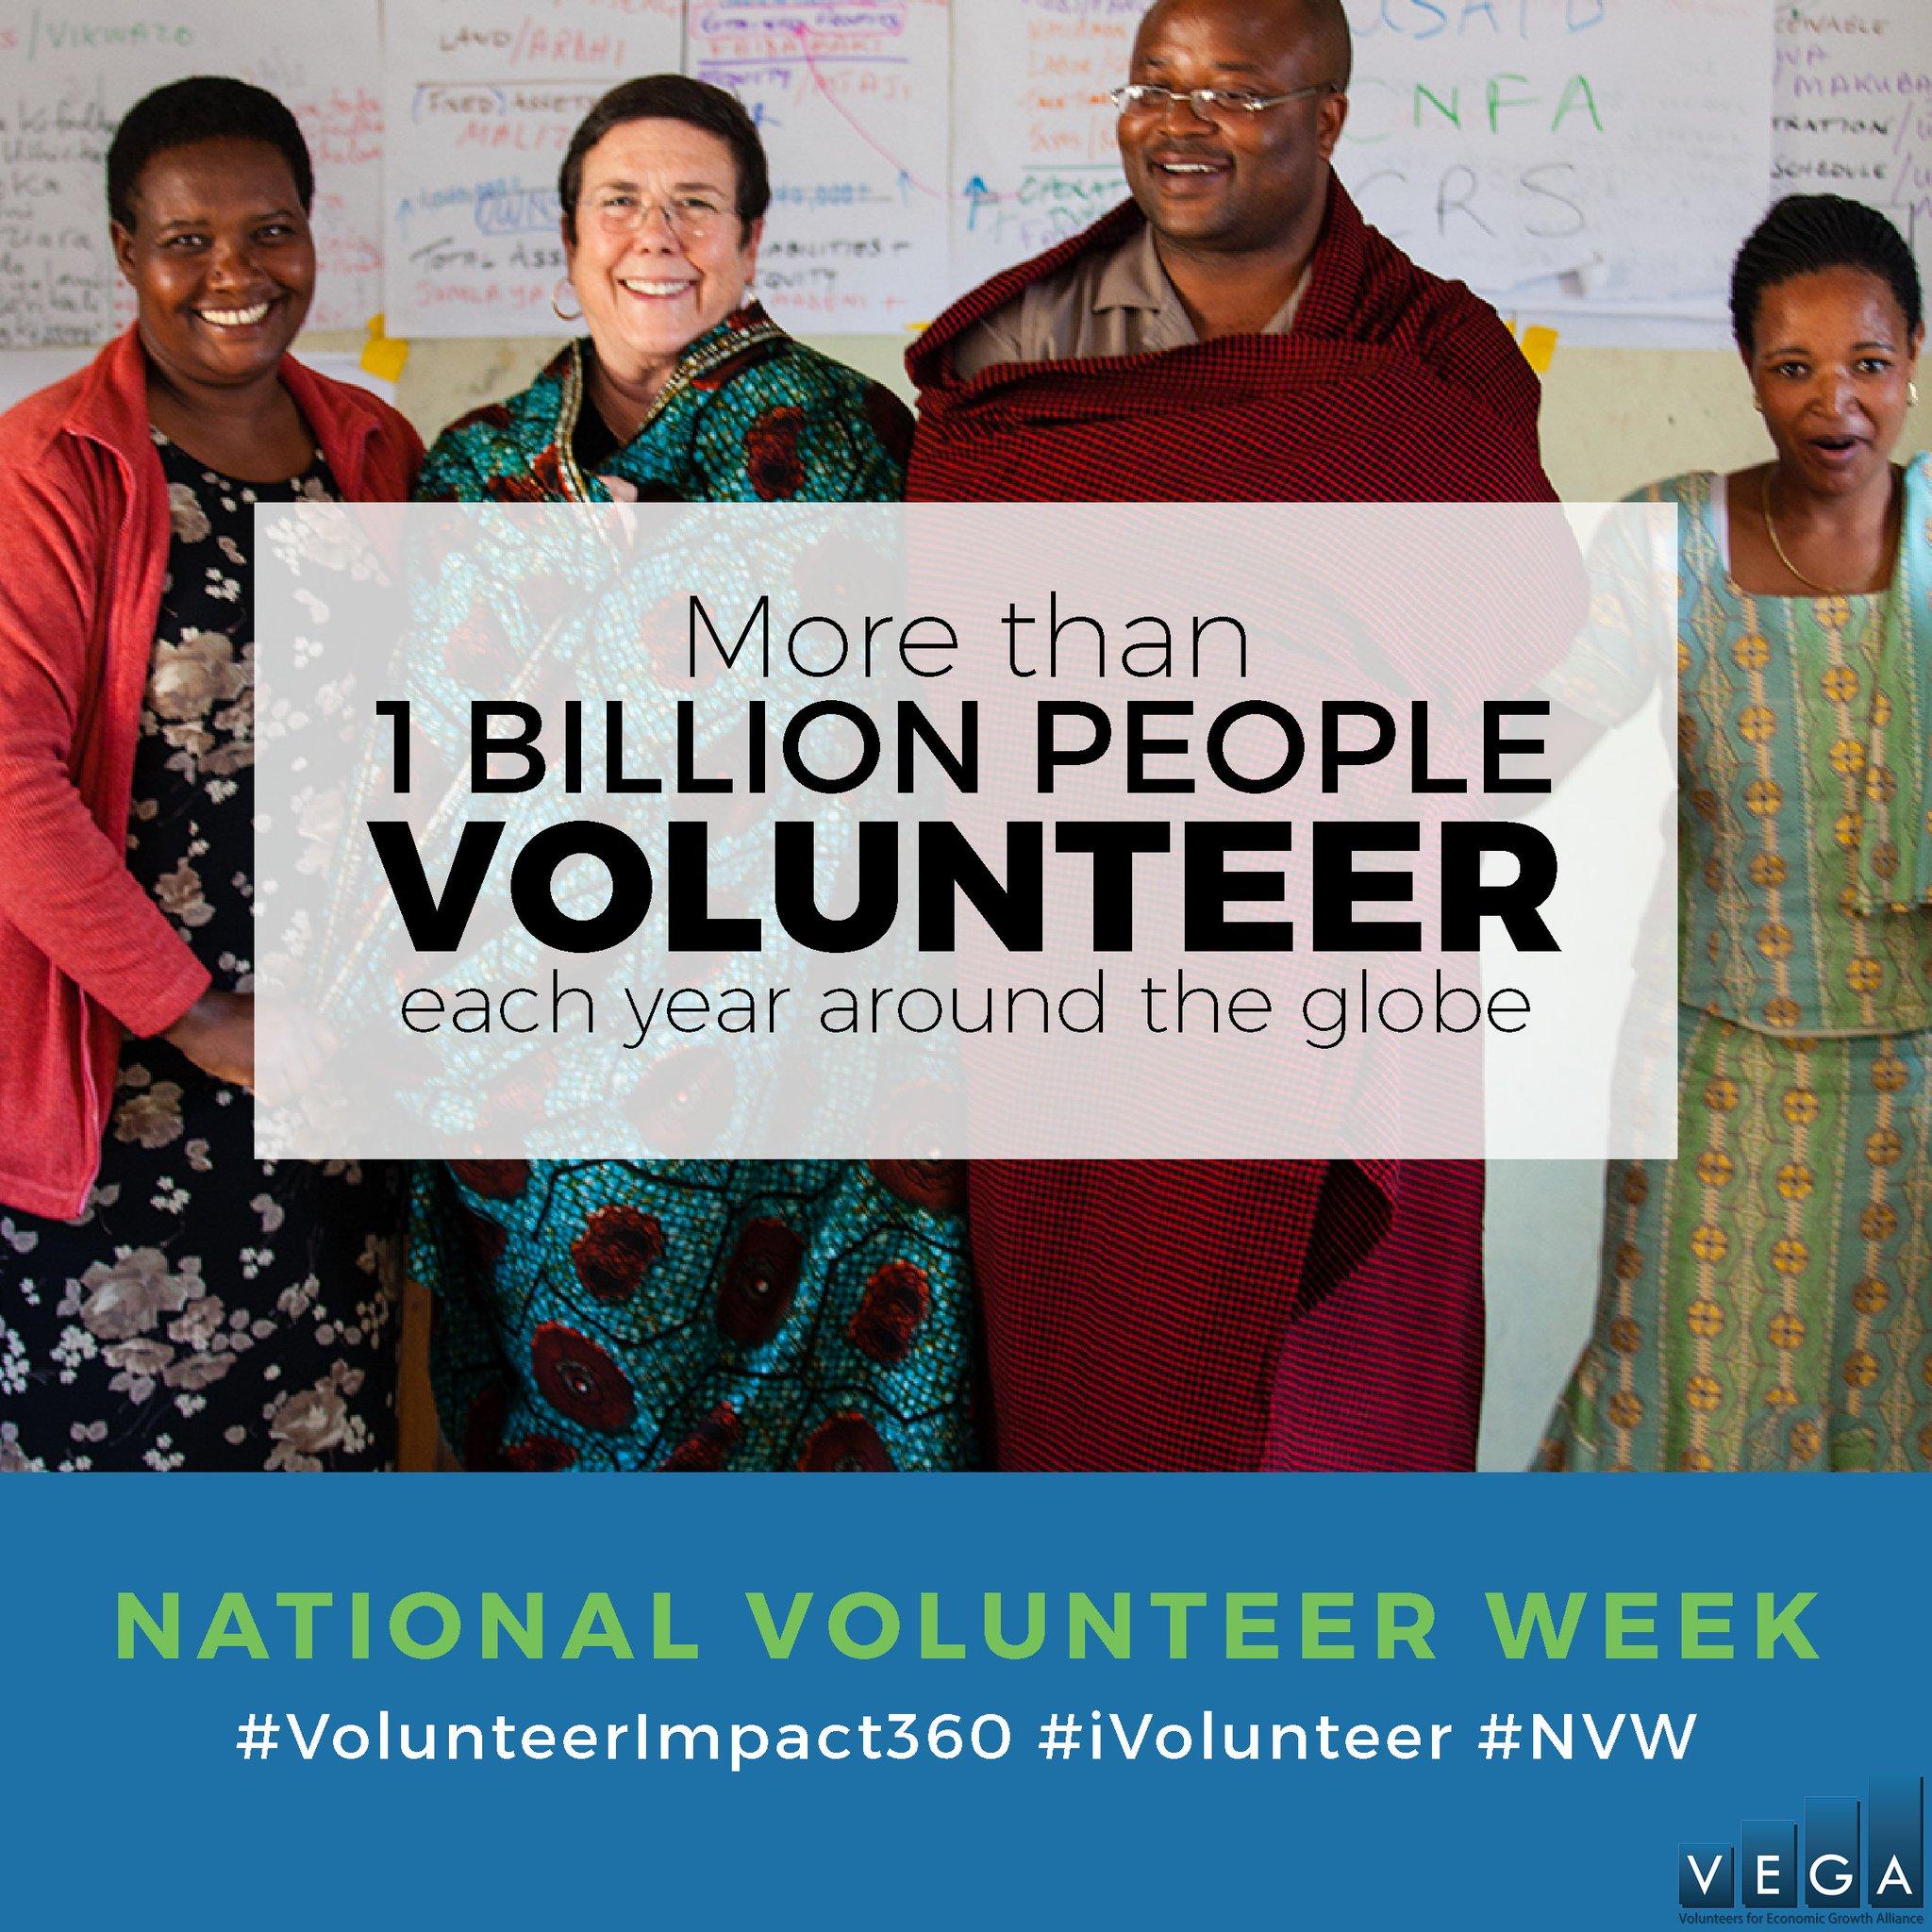 #DYK 1 BILLION people around the 🌎 volunteer every yr? If u #volunteer, give us a shout! #NVW #iVolunteer #VolunteerImpact360 @PointsofLight https://t.co/iFnf07ORx7